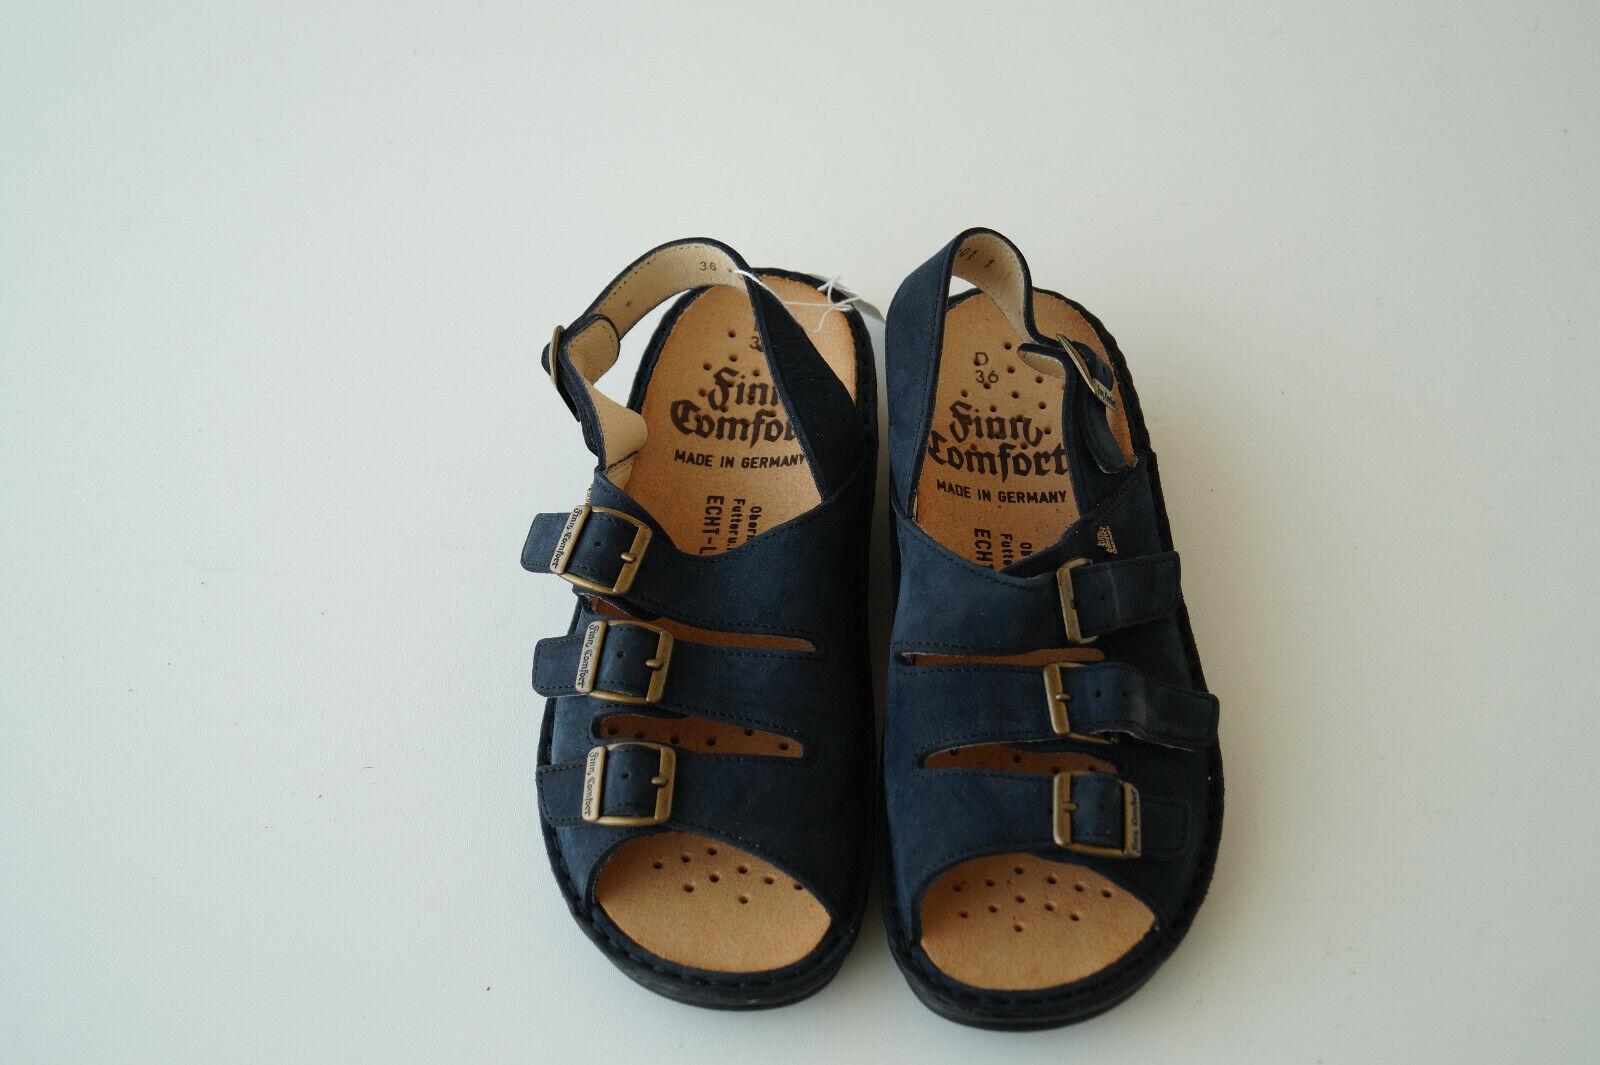 Finn Comfort Föhr Summer shoes Sandals Leather M Insoles Gr.36 Nubuck Navy New